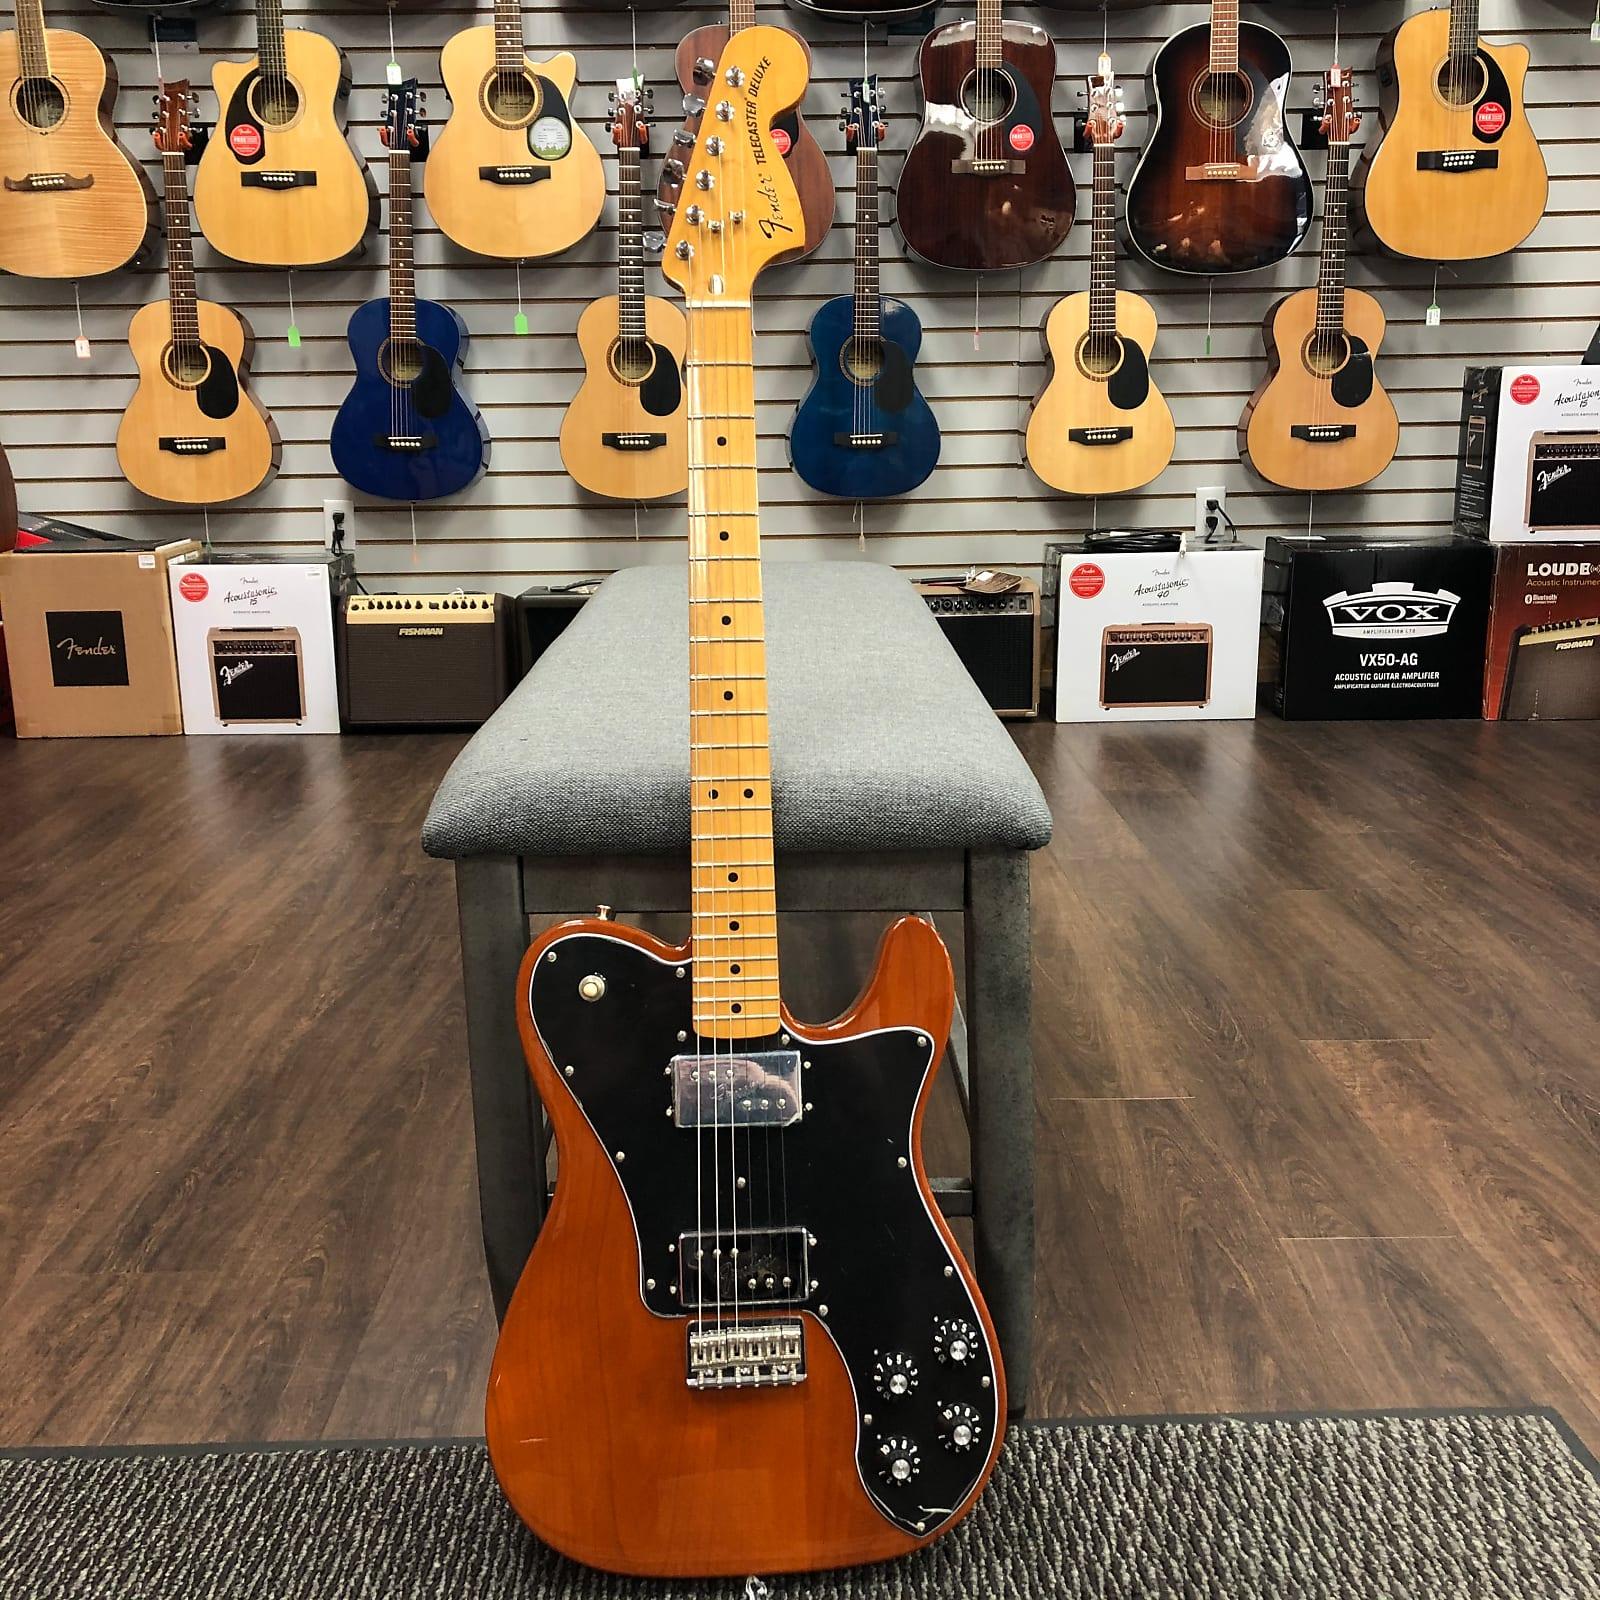 Fender Vintera '70s Telecaster Deluxe - Mocha, Maple Fretboard